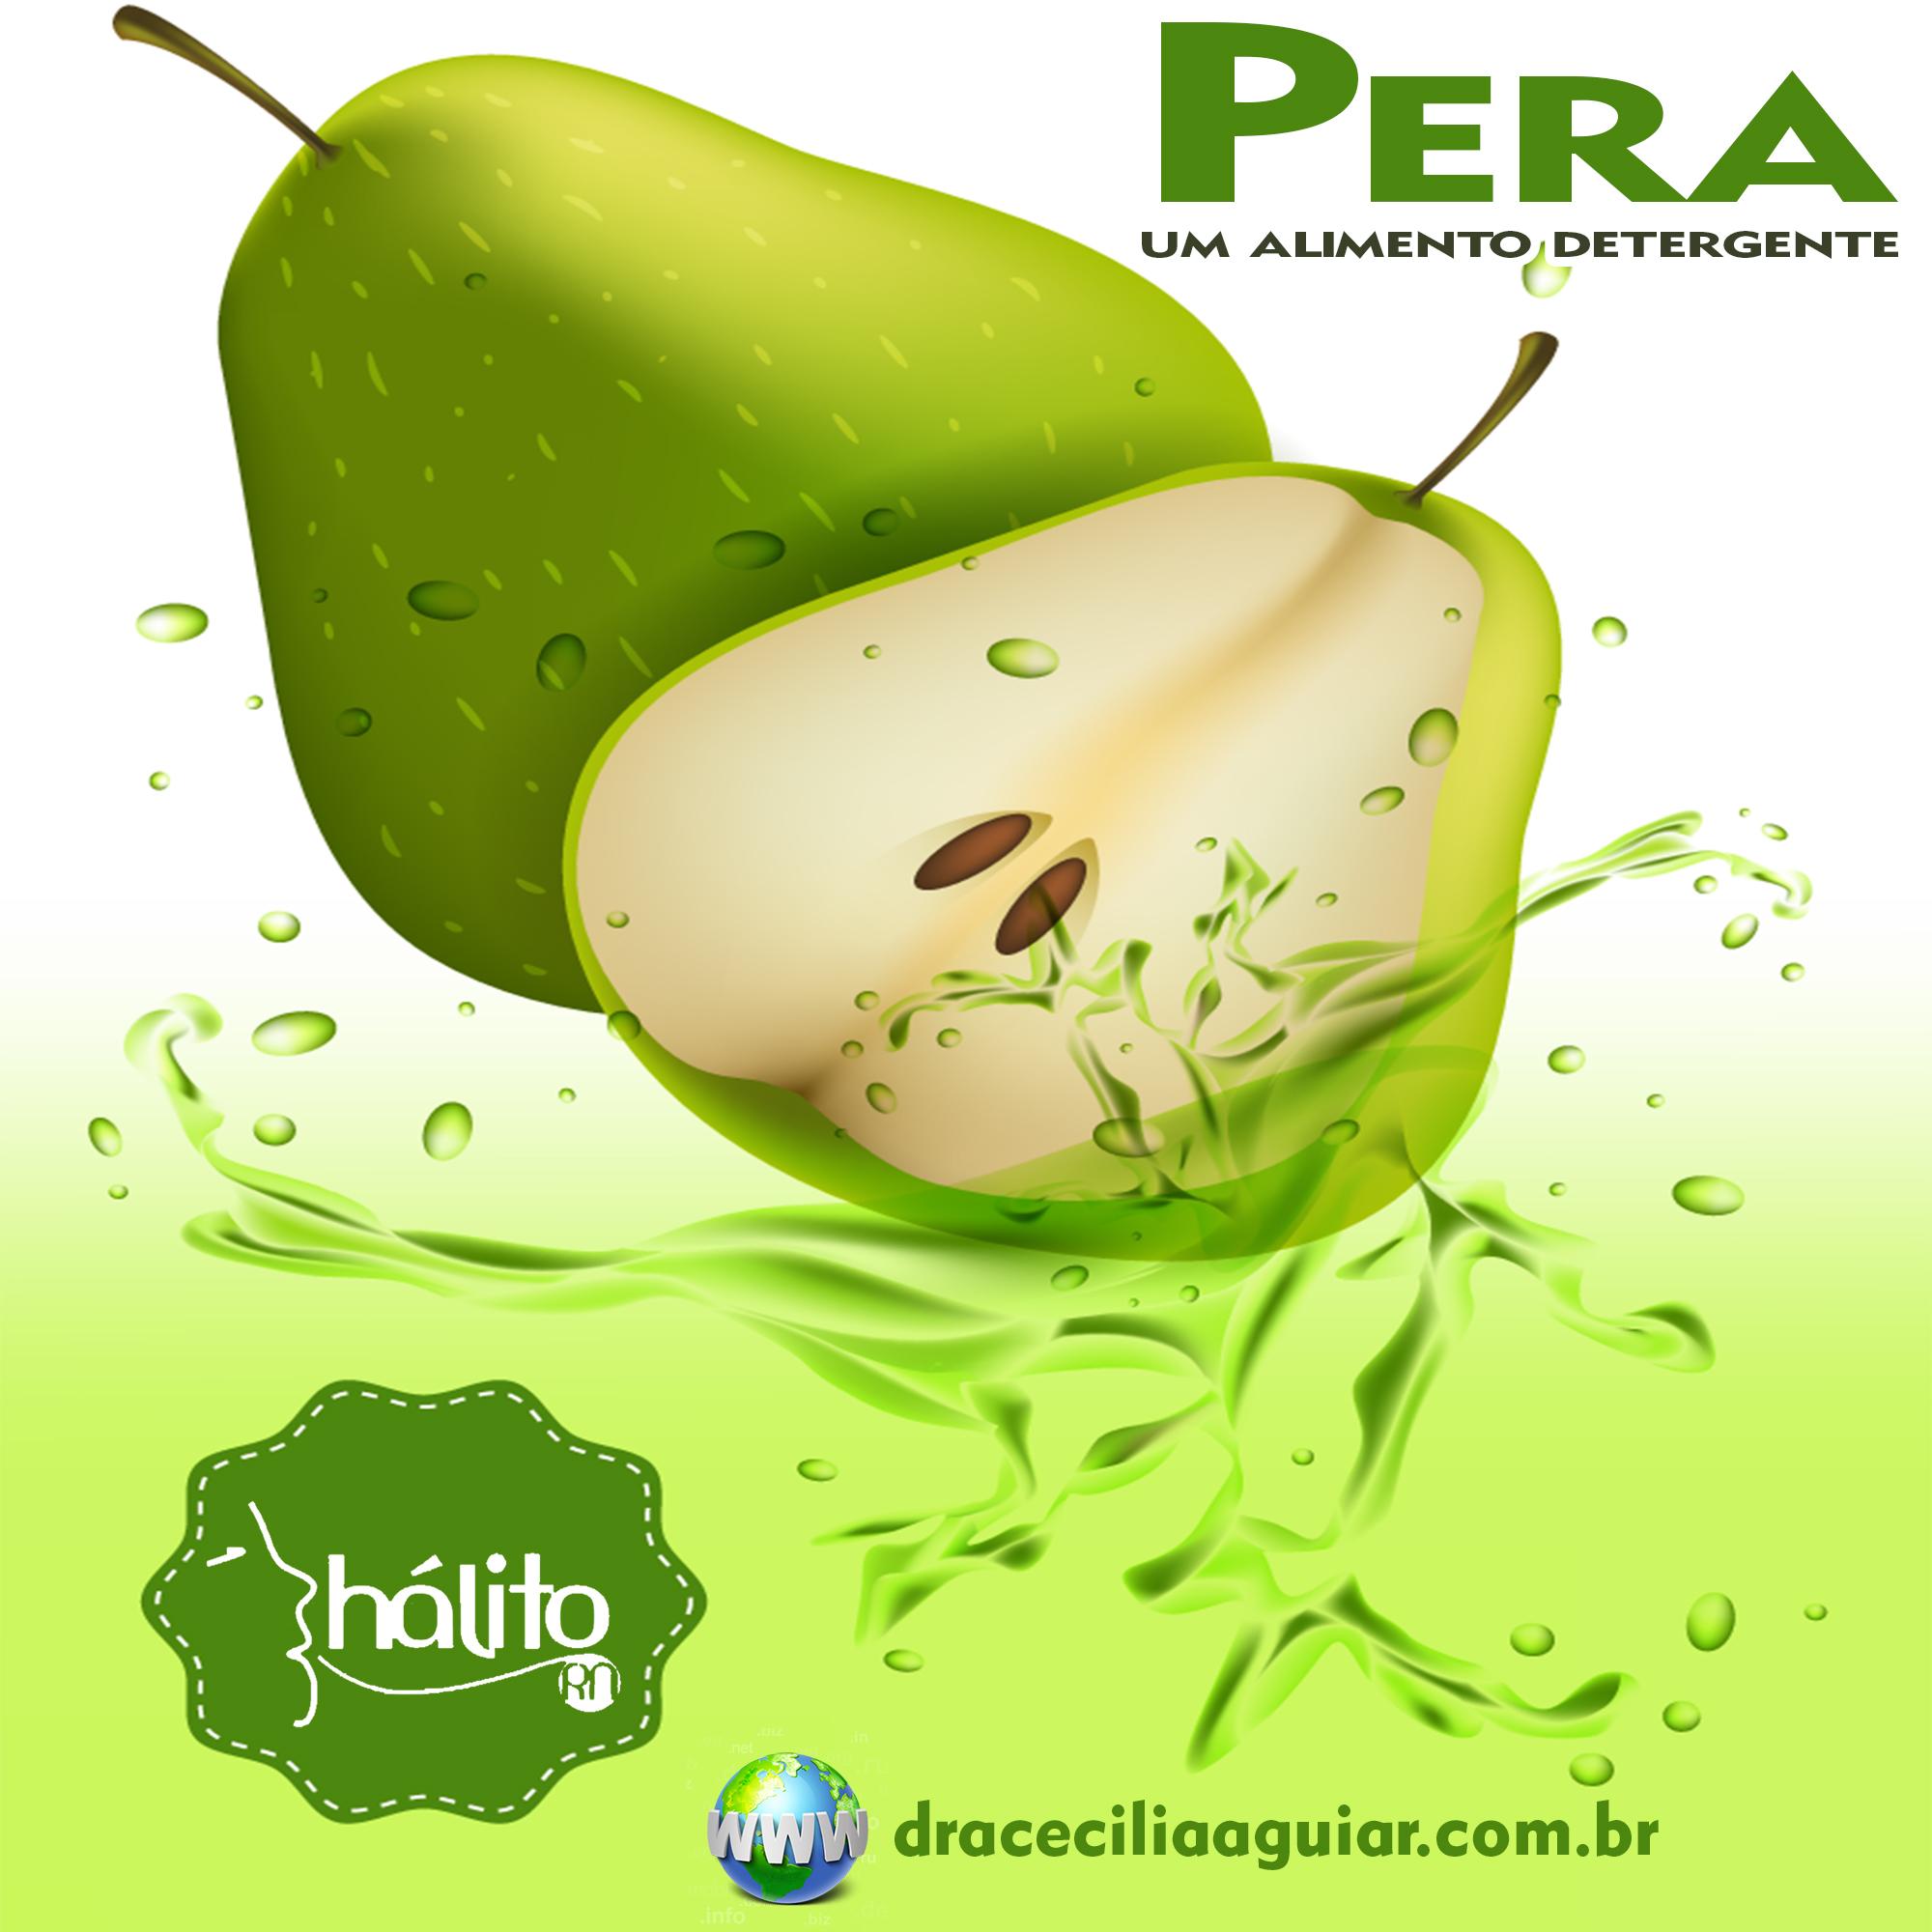 Pera: um alimento detergente